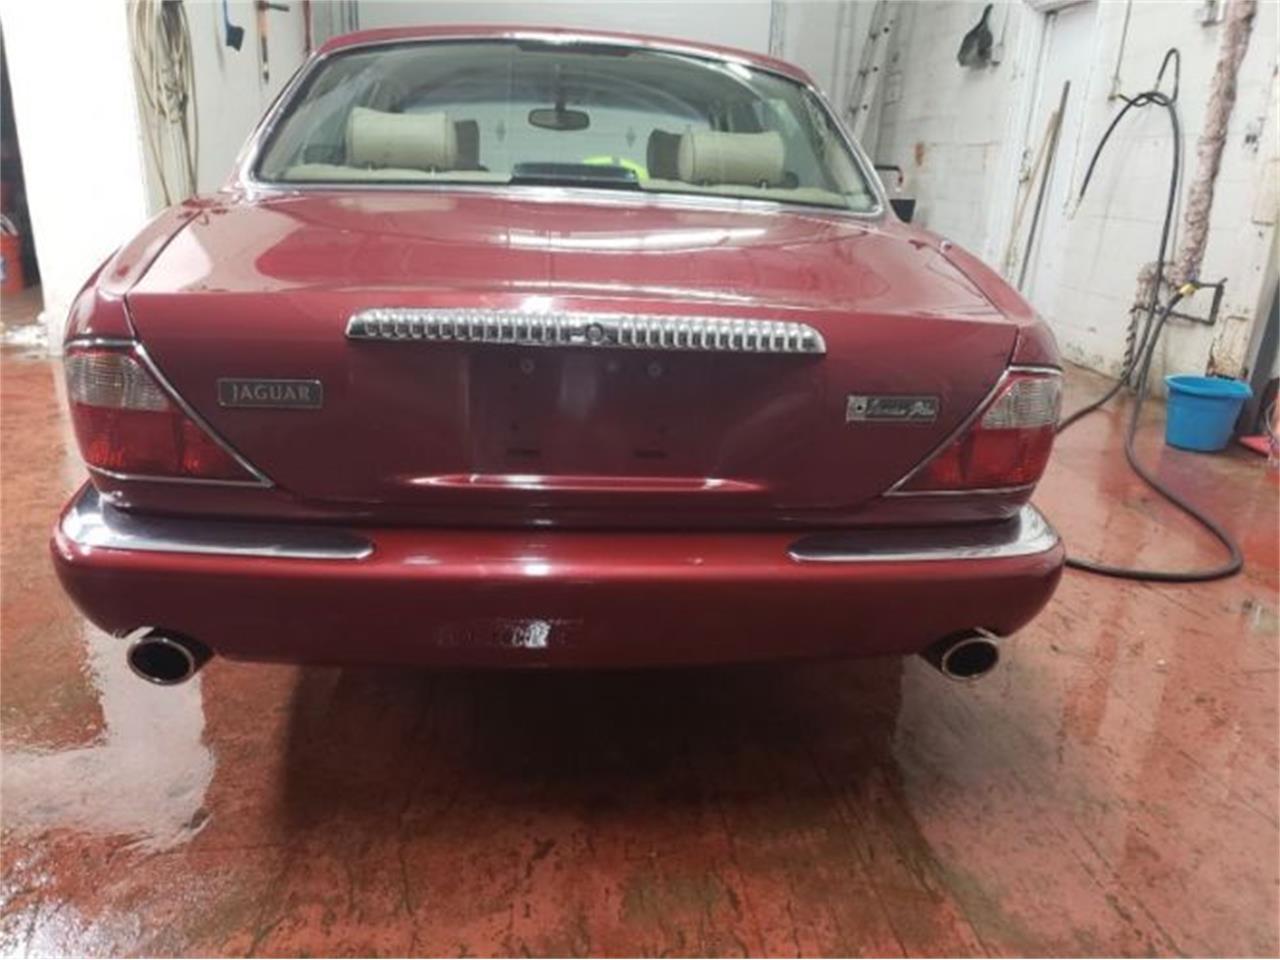 2000 Jaguar XJ8 (CC-1410499) for sale in Cadillac, Michigan